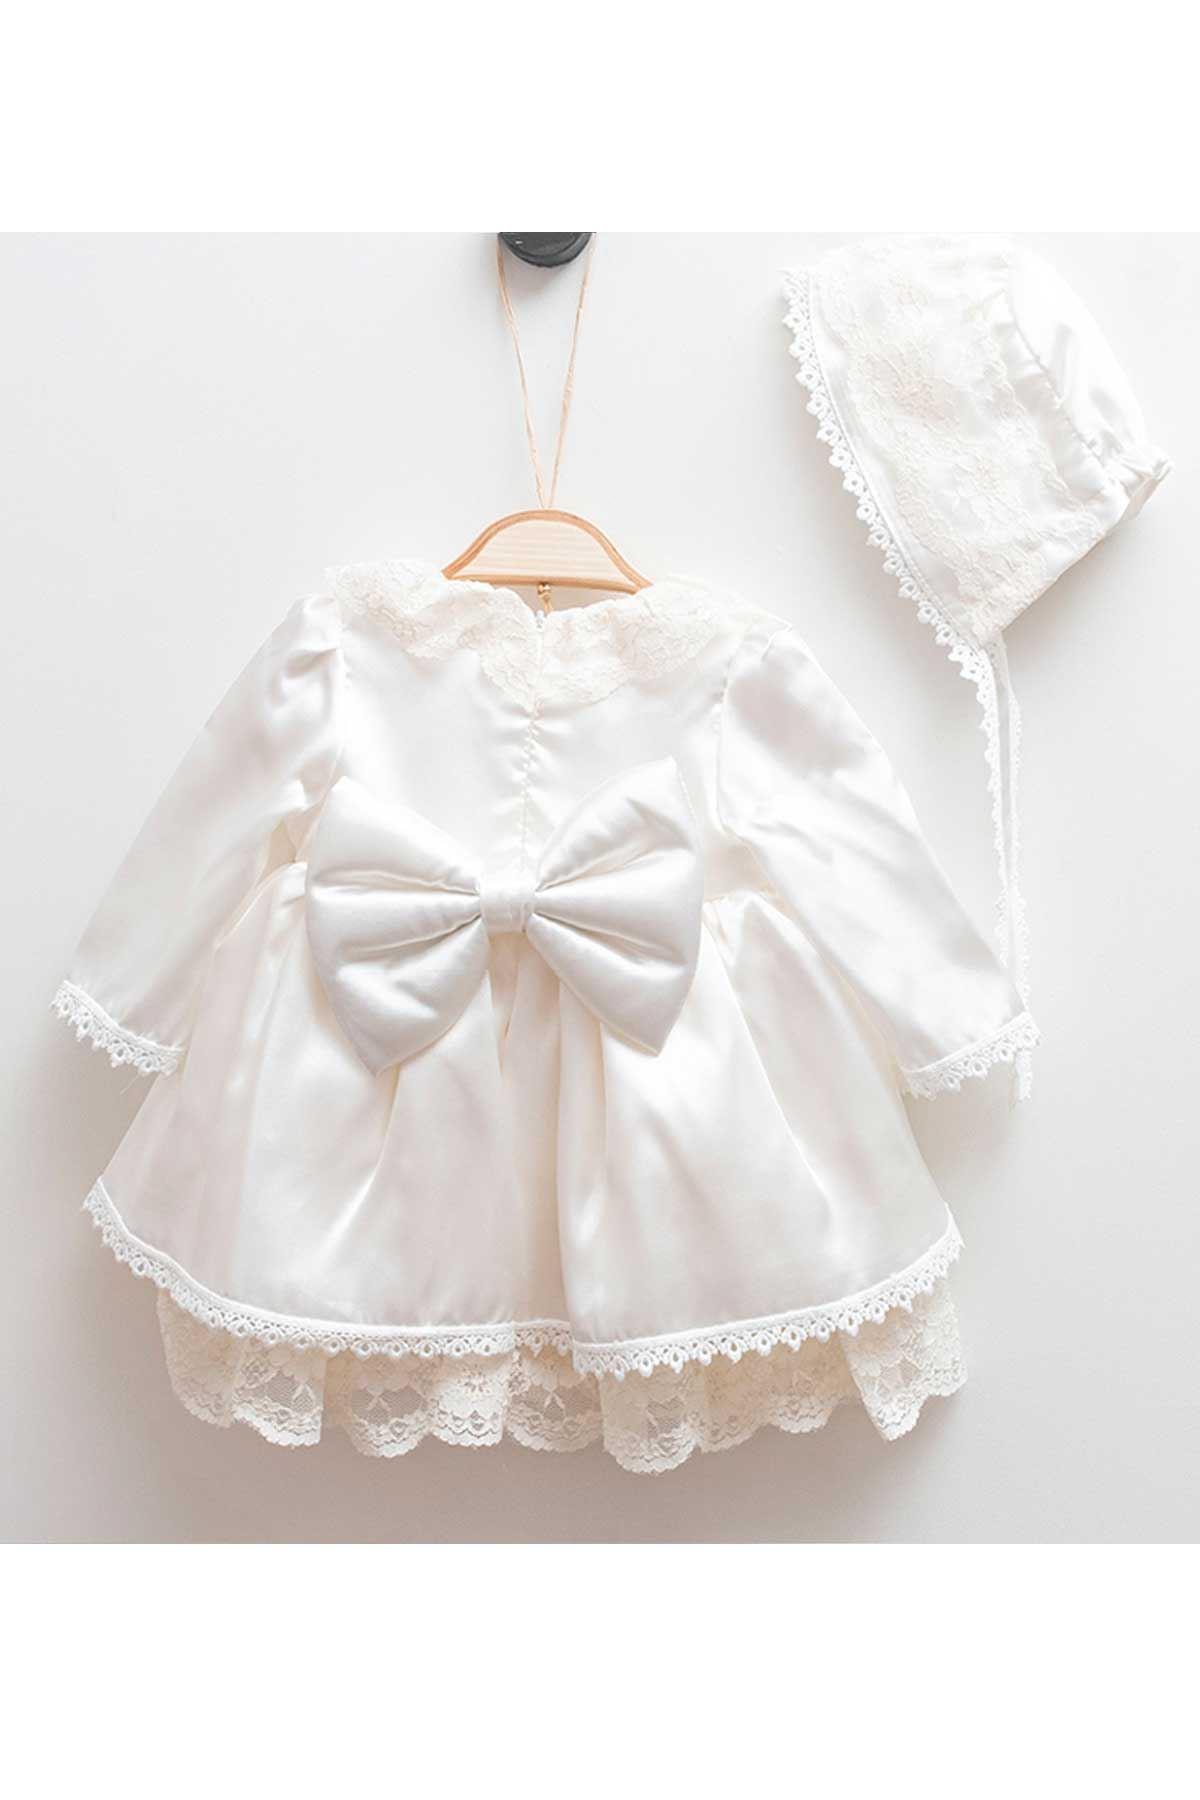 Krem Pelerin Dantel Kız Bebek Elbise Set